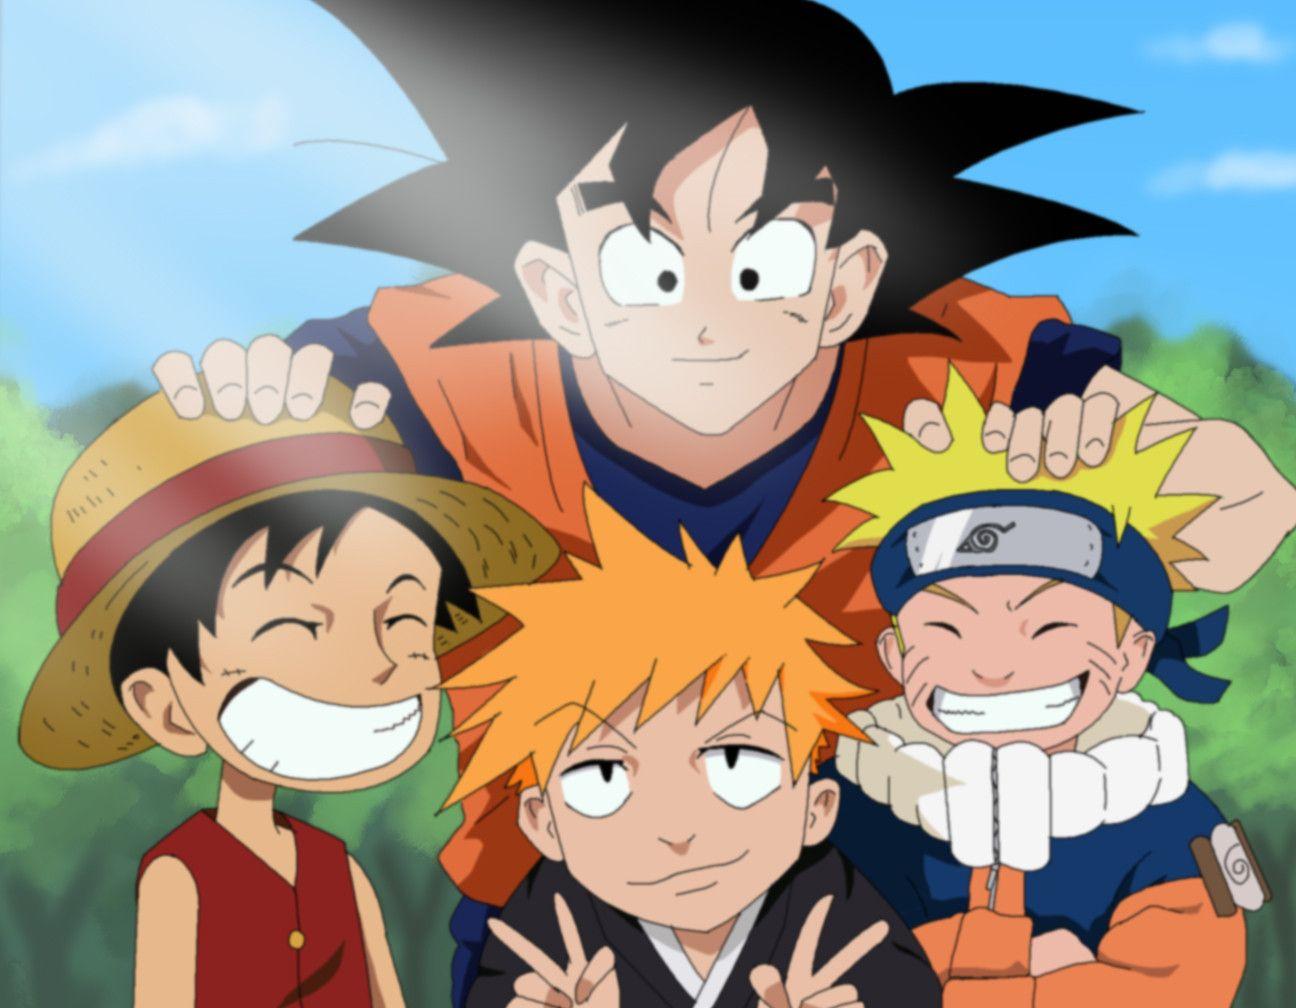 Fantastic Wallpaper Naruto Dbz - a27734c93d03c28b9cde4d20f00100a7  Snapshot_85665.jpg